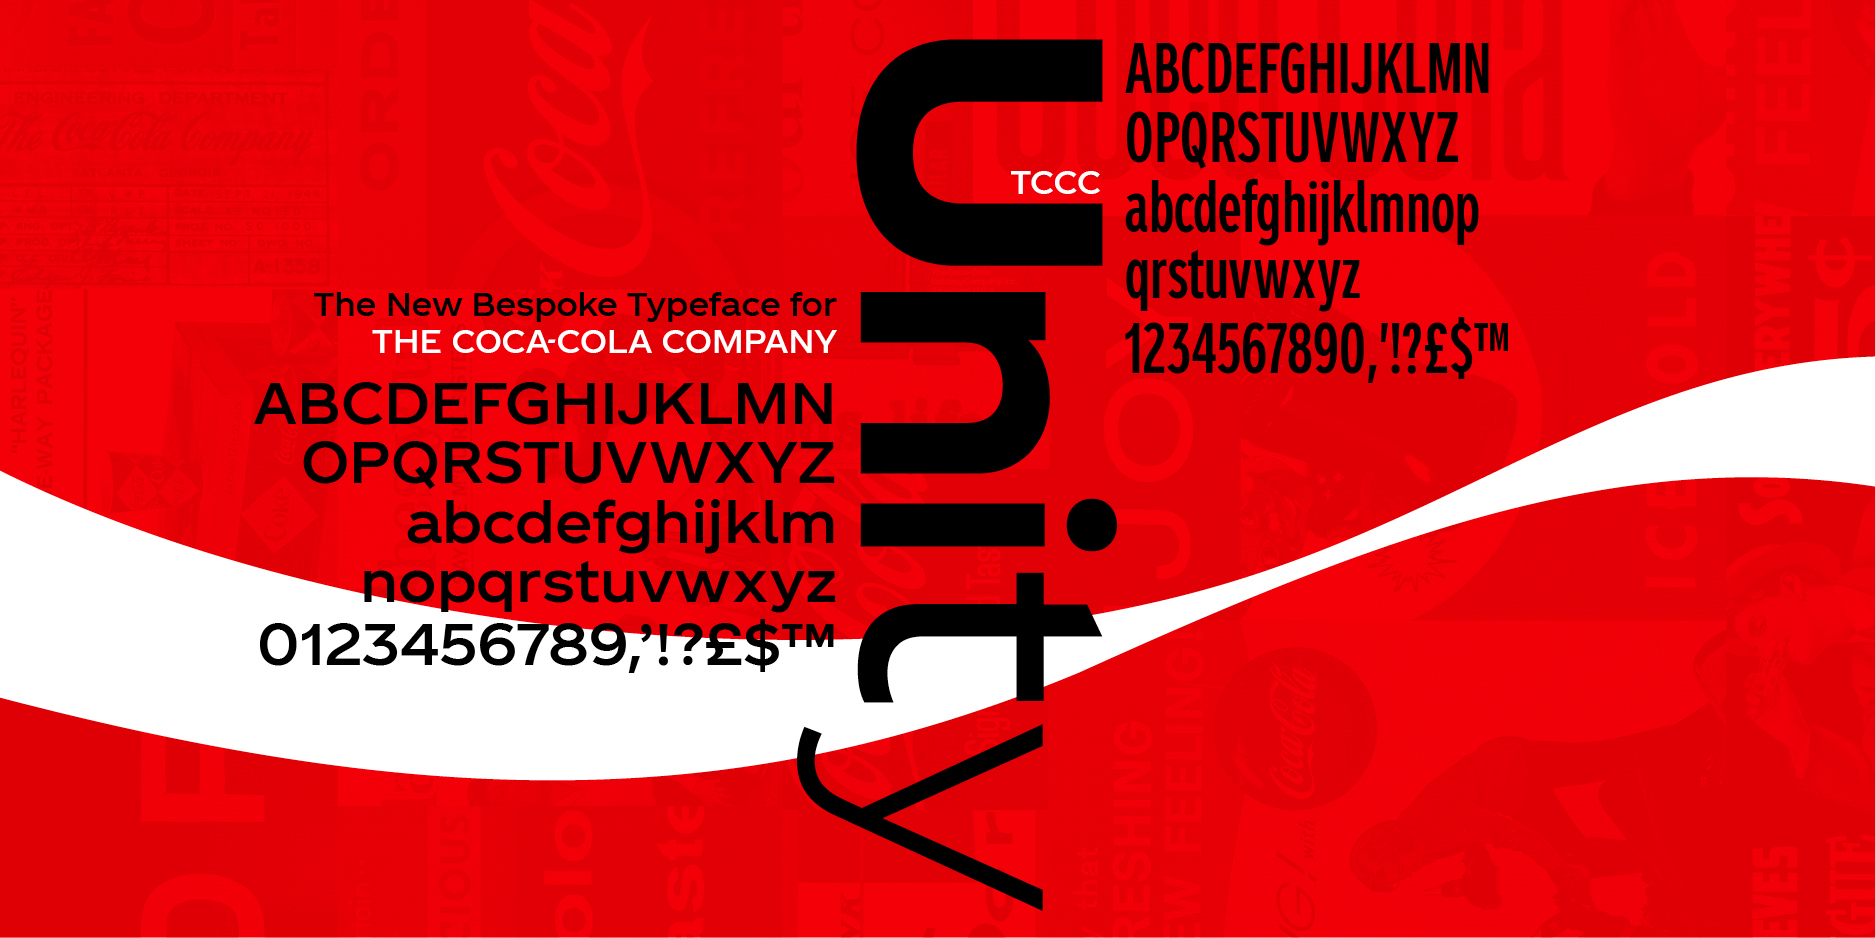 TCCC Unity